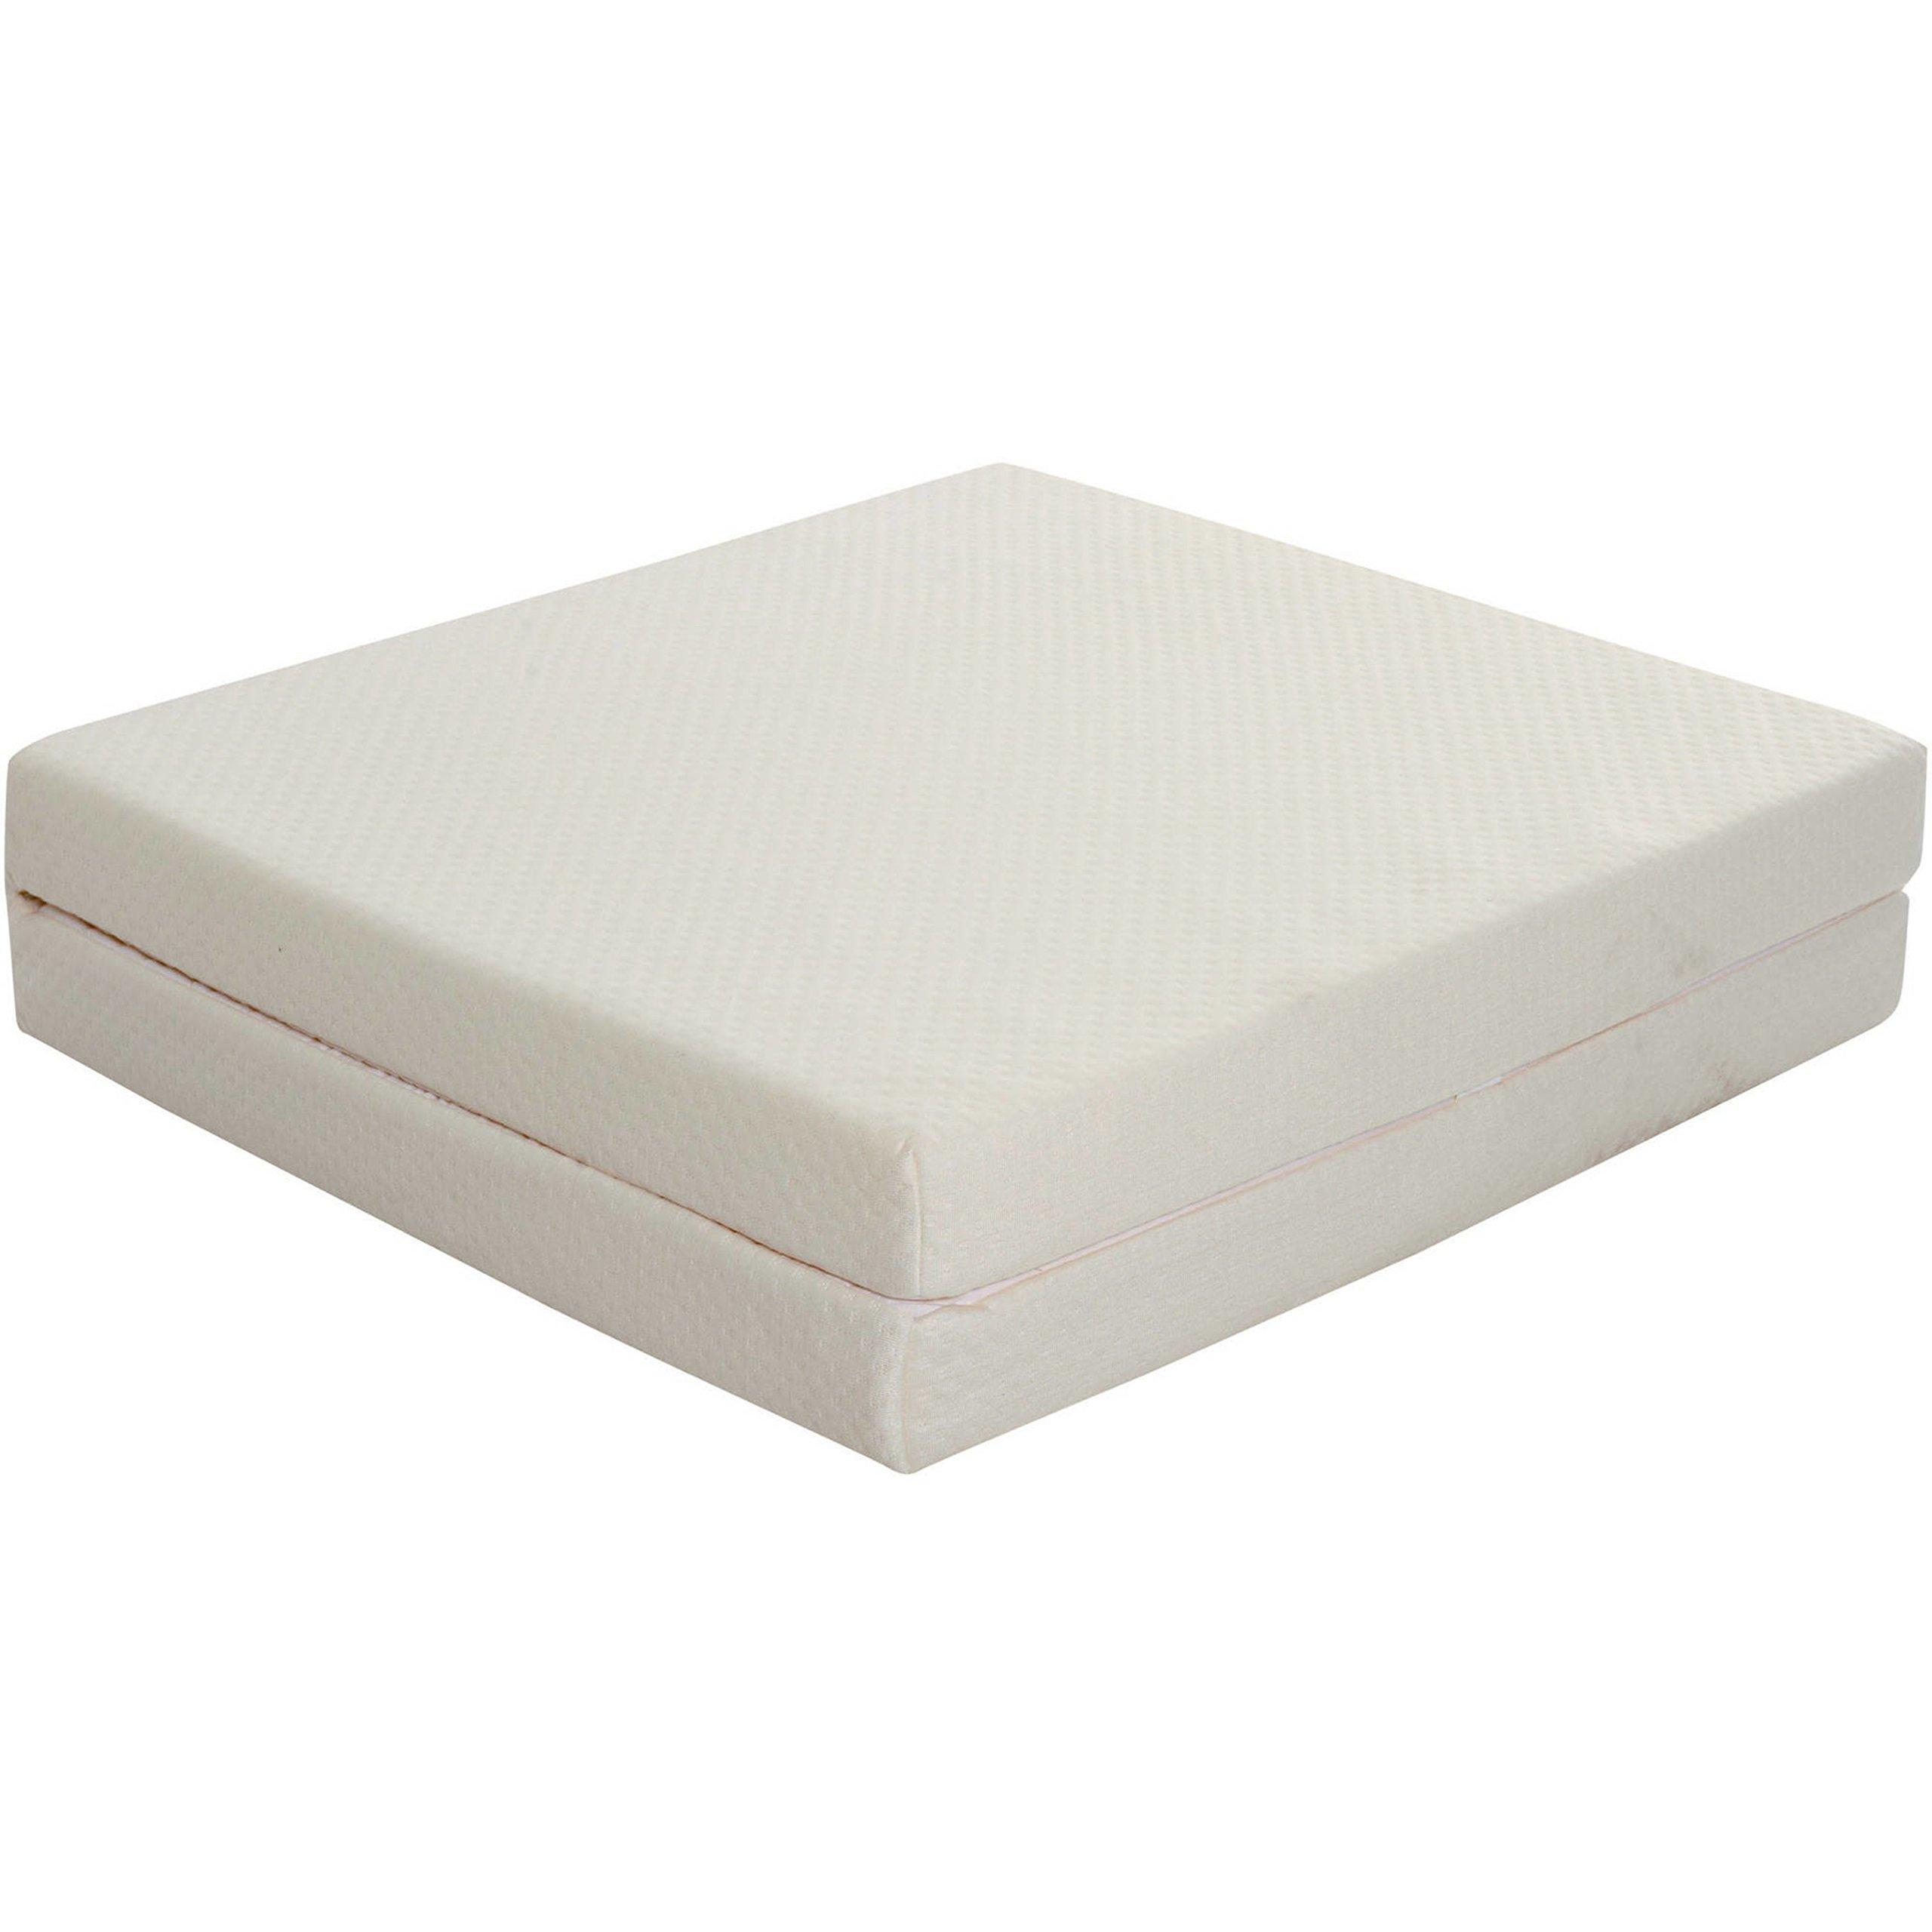 Comfortable Soft Breathable Bamboo Material Crib Mattress